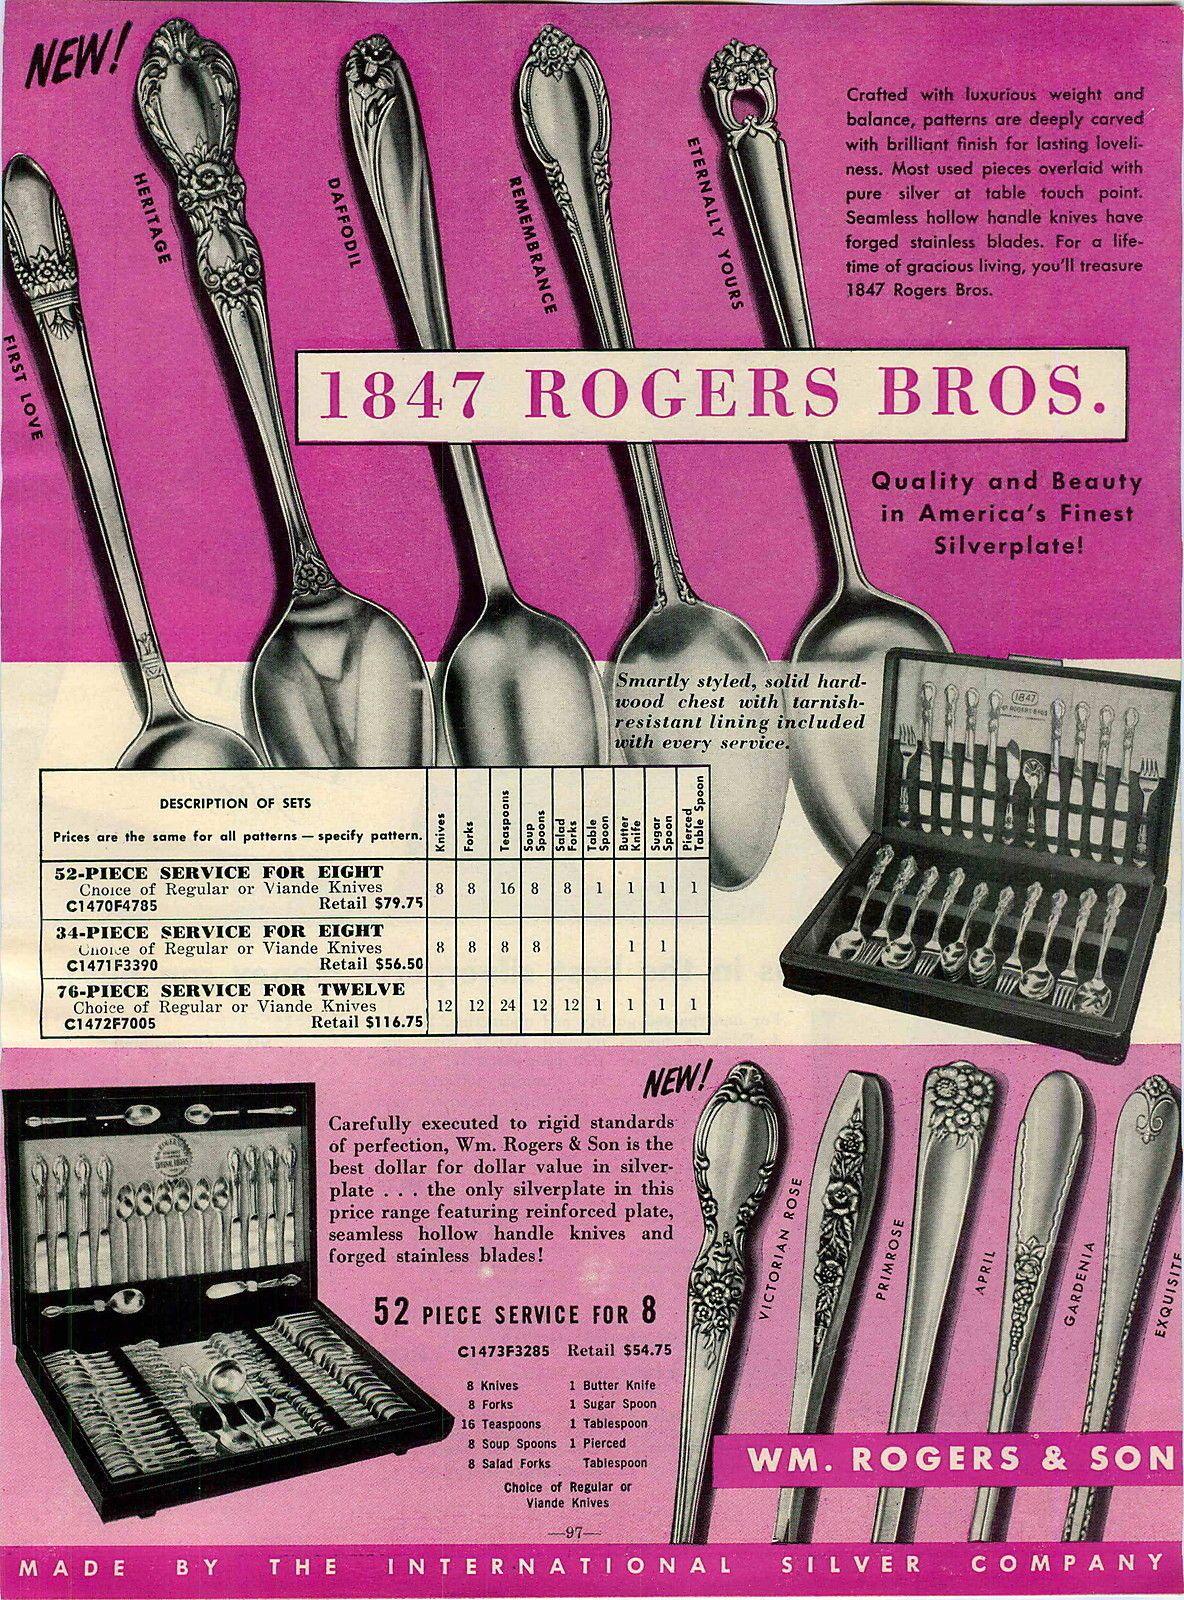 1955 Ad 1847 Rogers Bros Flatware Silverware Love